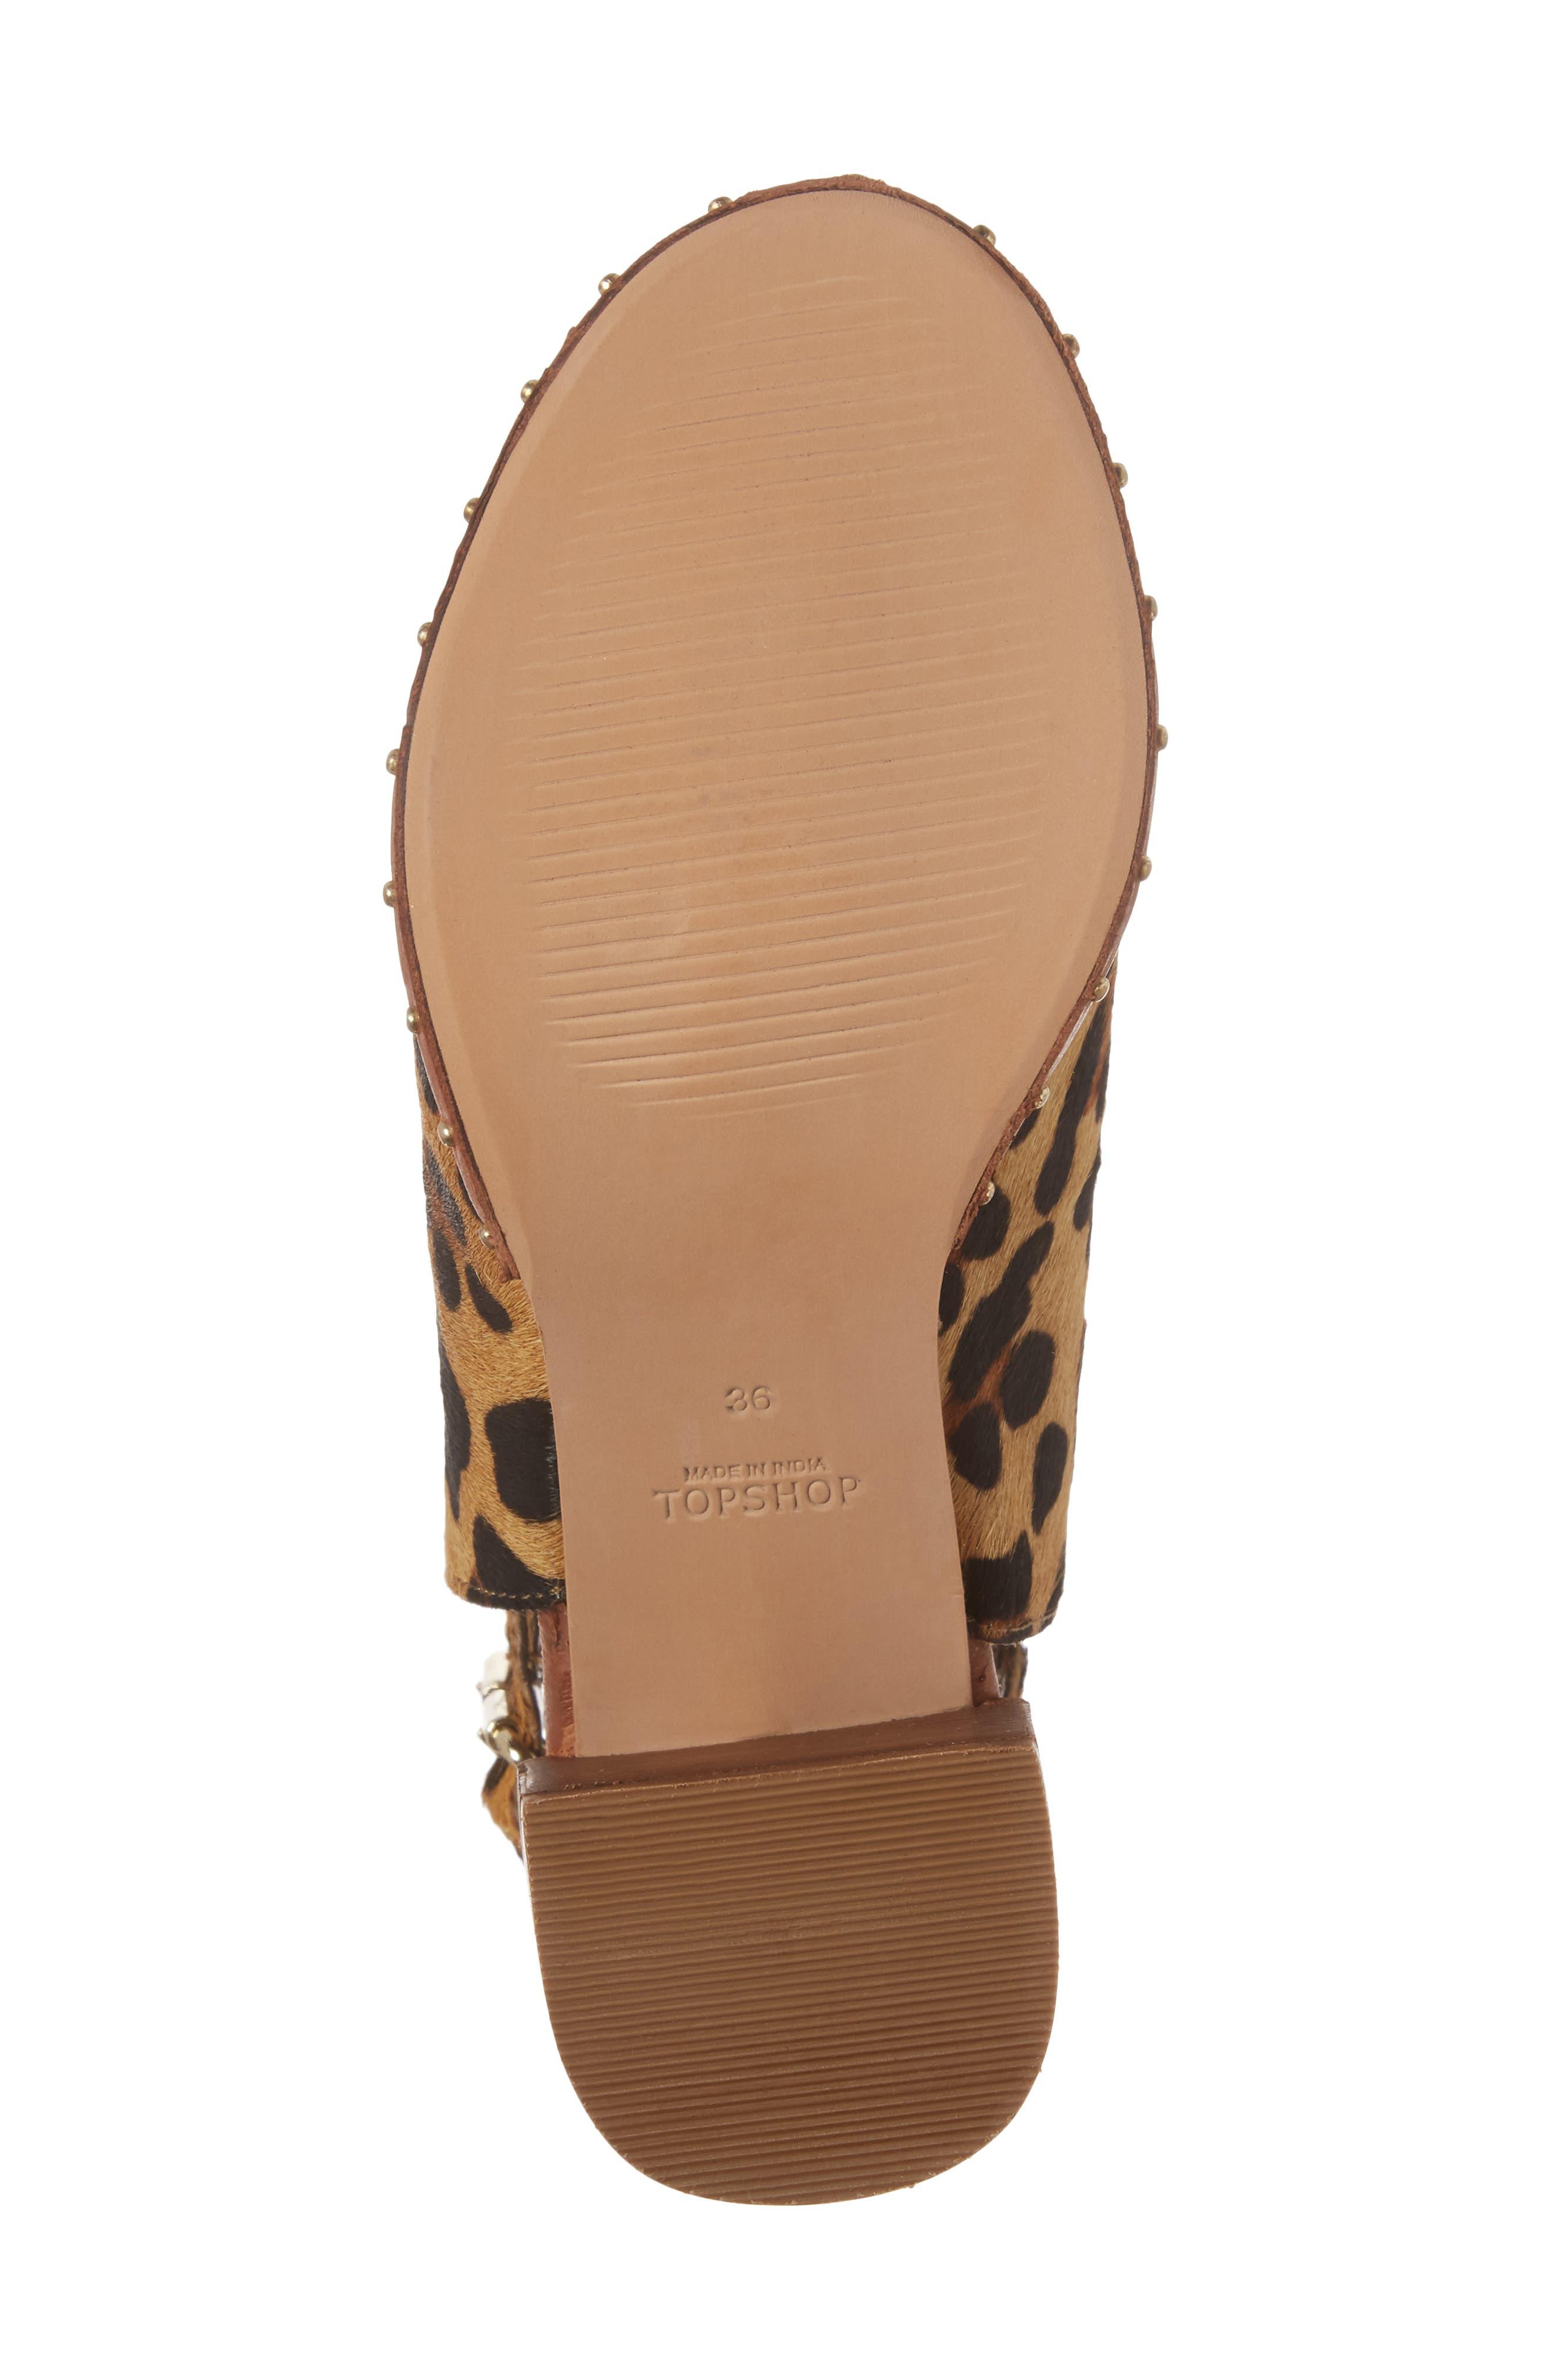 North Studded Bootie Sandal,                             Alternate thumbnail 6, color,                             Leopard